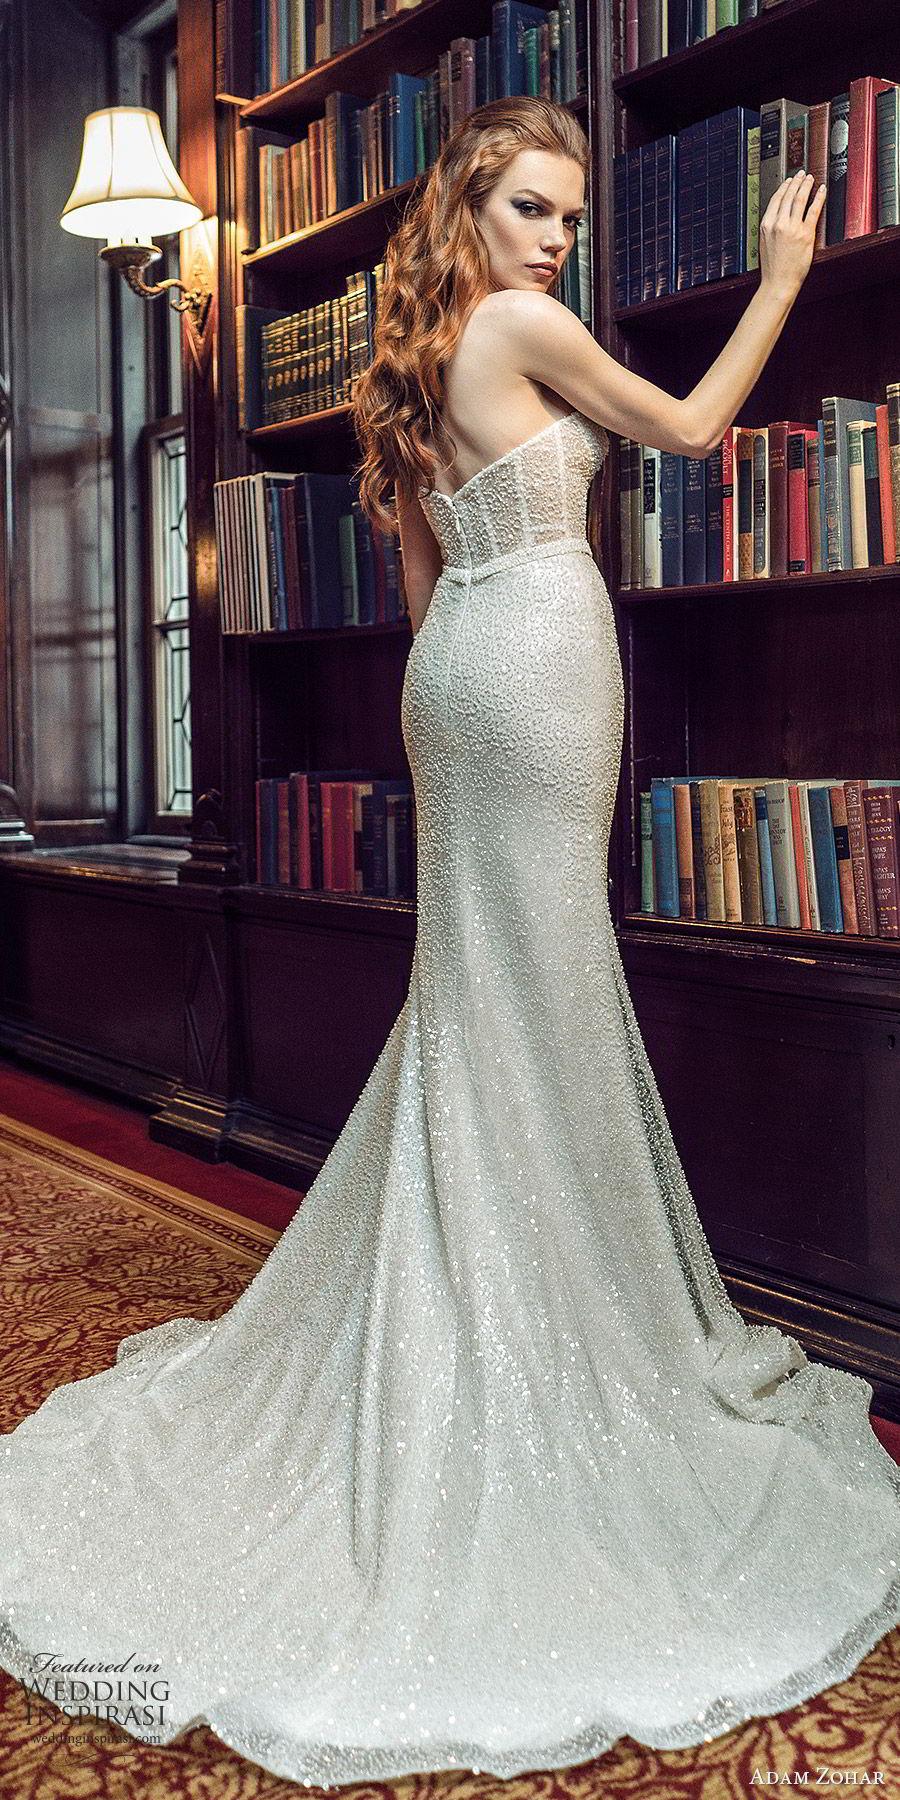 adam zohar 2020 bridal strapless semi sweetheart fully embellished trumpet fit flare mermaid wedding dress (10) glitzy glam slit skirt chapel train bv